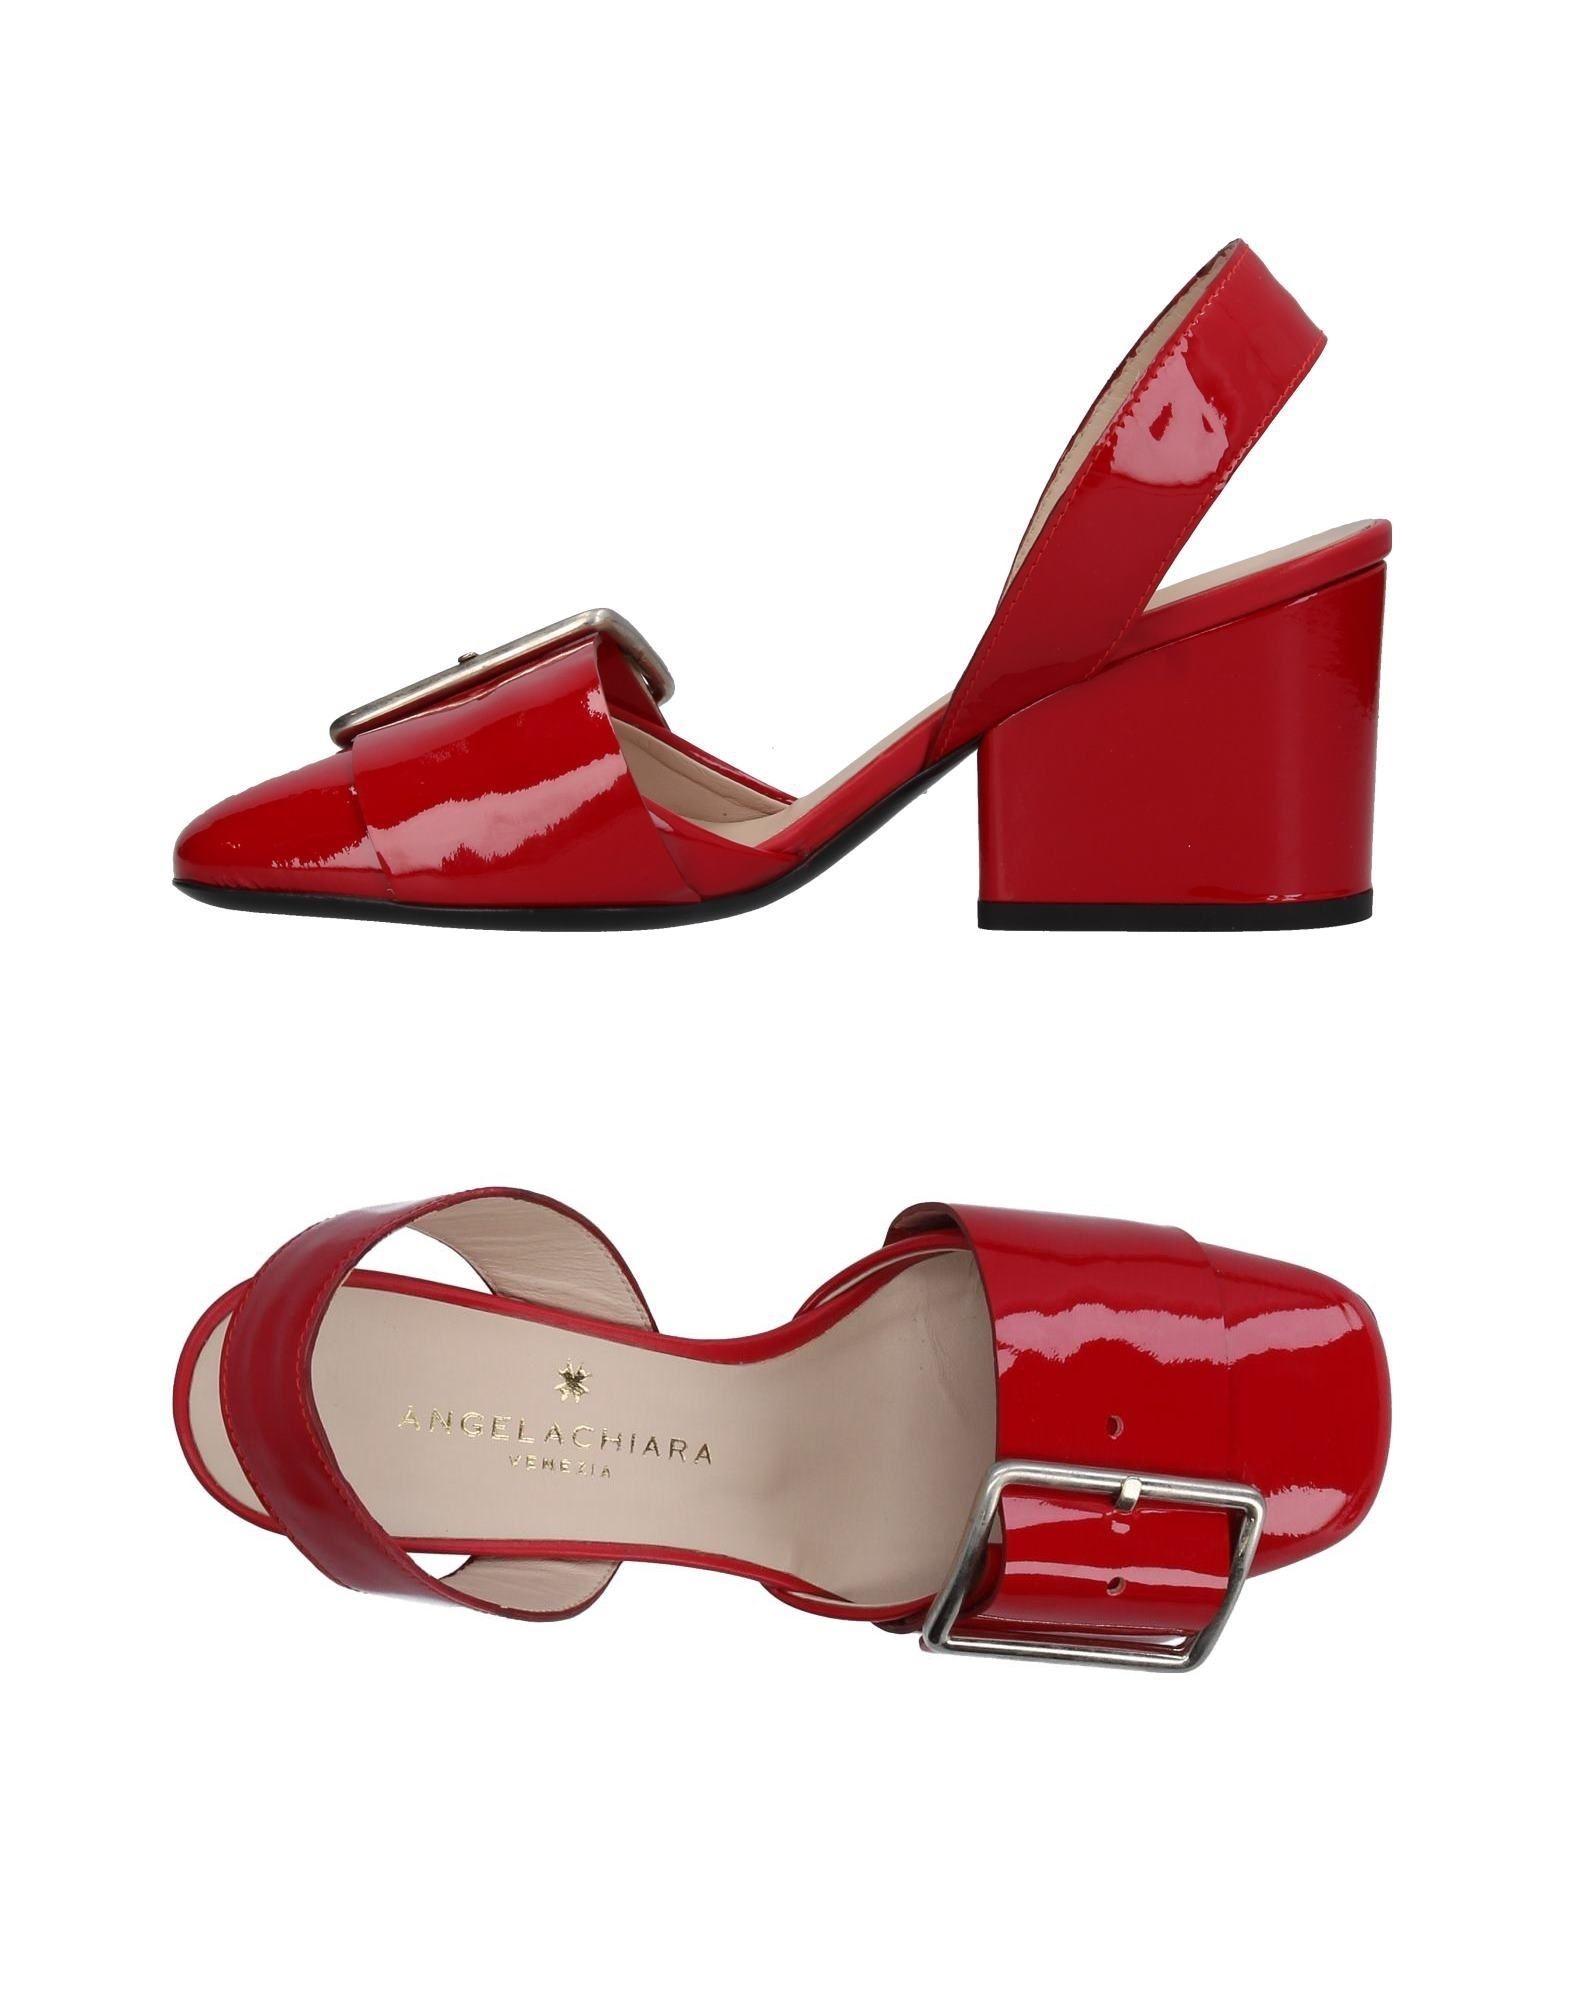 ANGELA CHIARA VENEZIA Sandals in Red